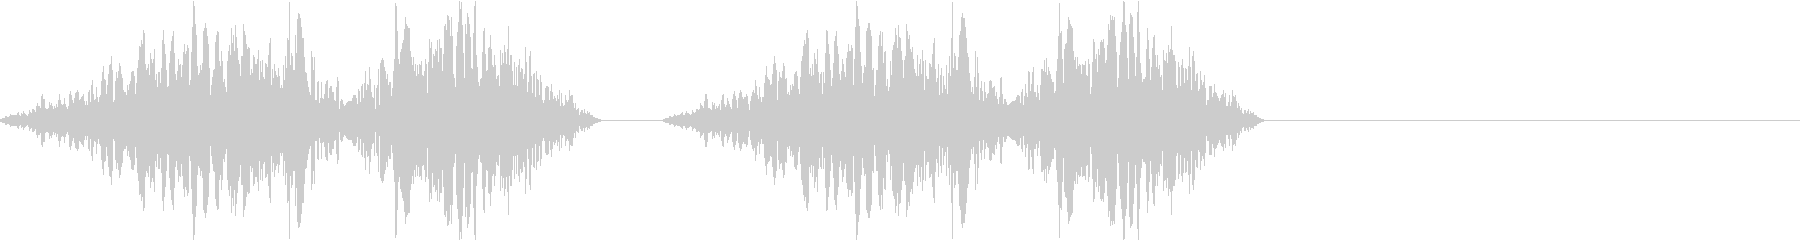 DJプレイ スクラッチ・ノイズ 201の未再生の波形